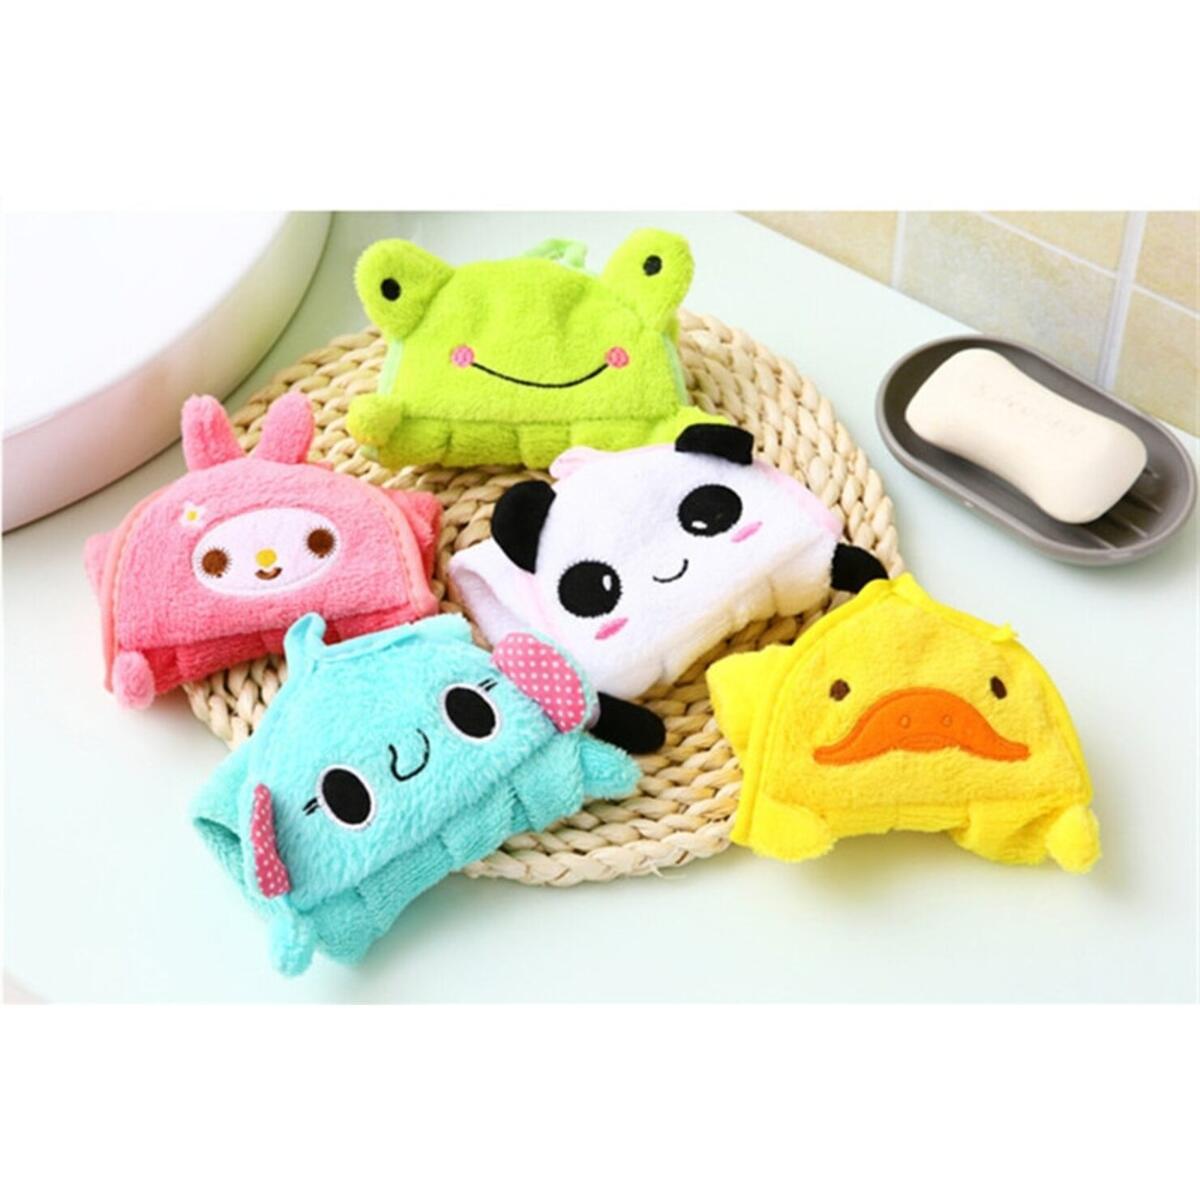 Baby Nursery Hand Towel Baby Bath Towels Toddler Soft Plush Cartoon Animal Wipe Hanging Bathing Children Bathroom Towel